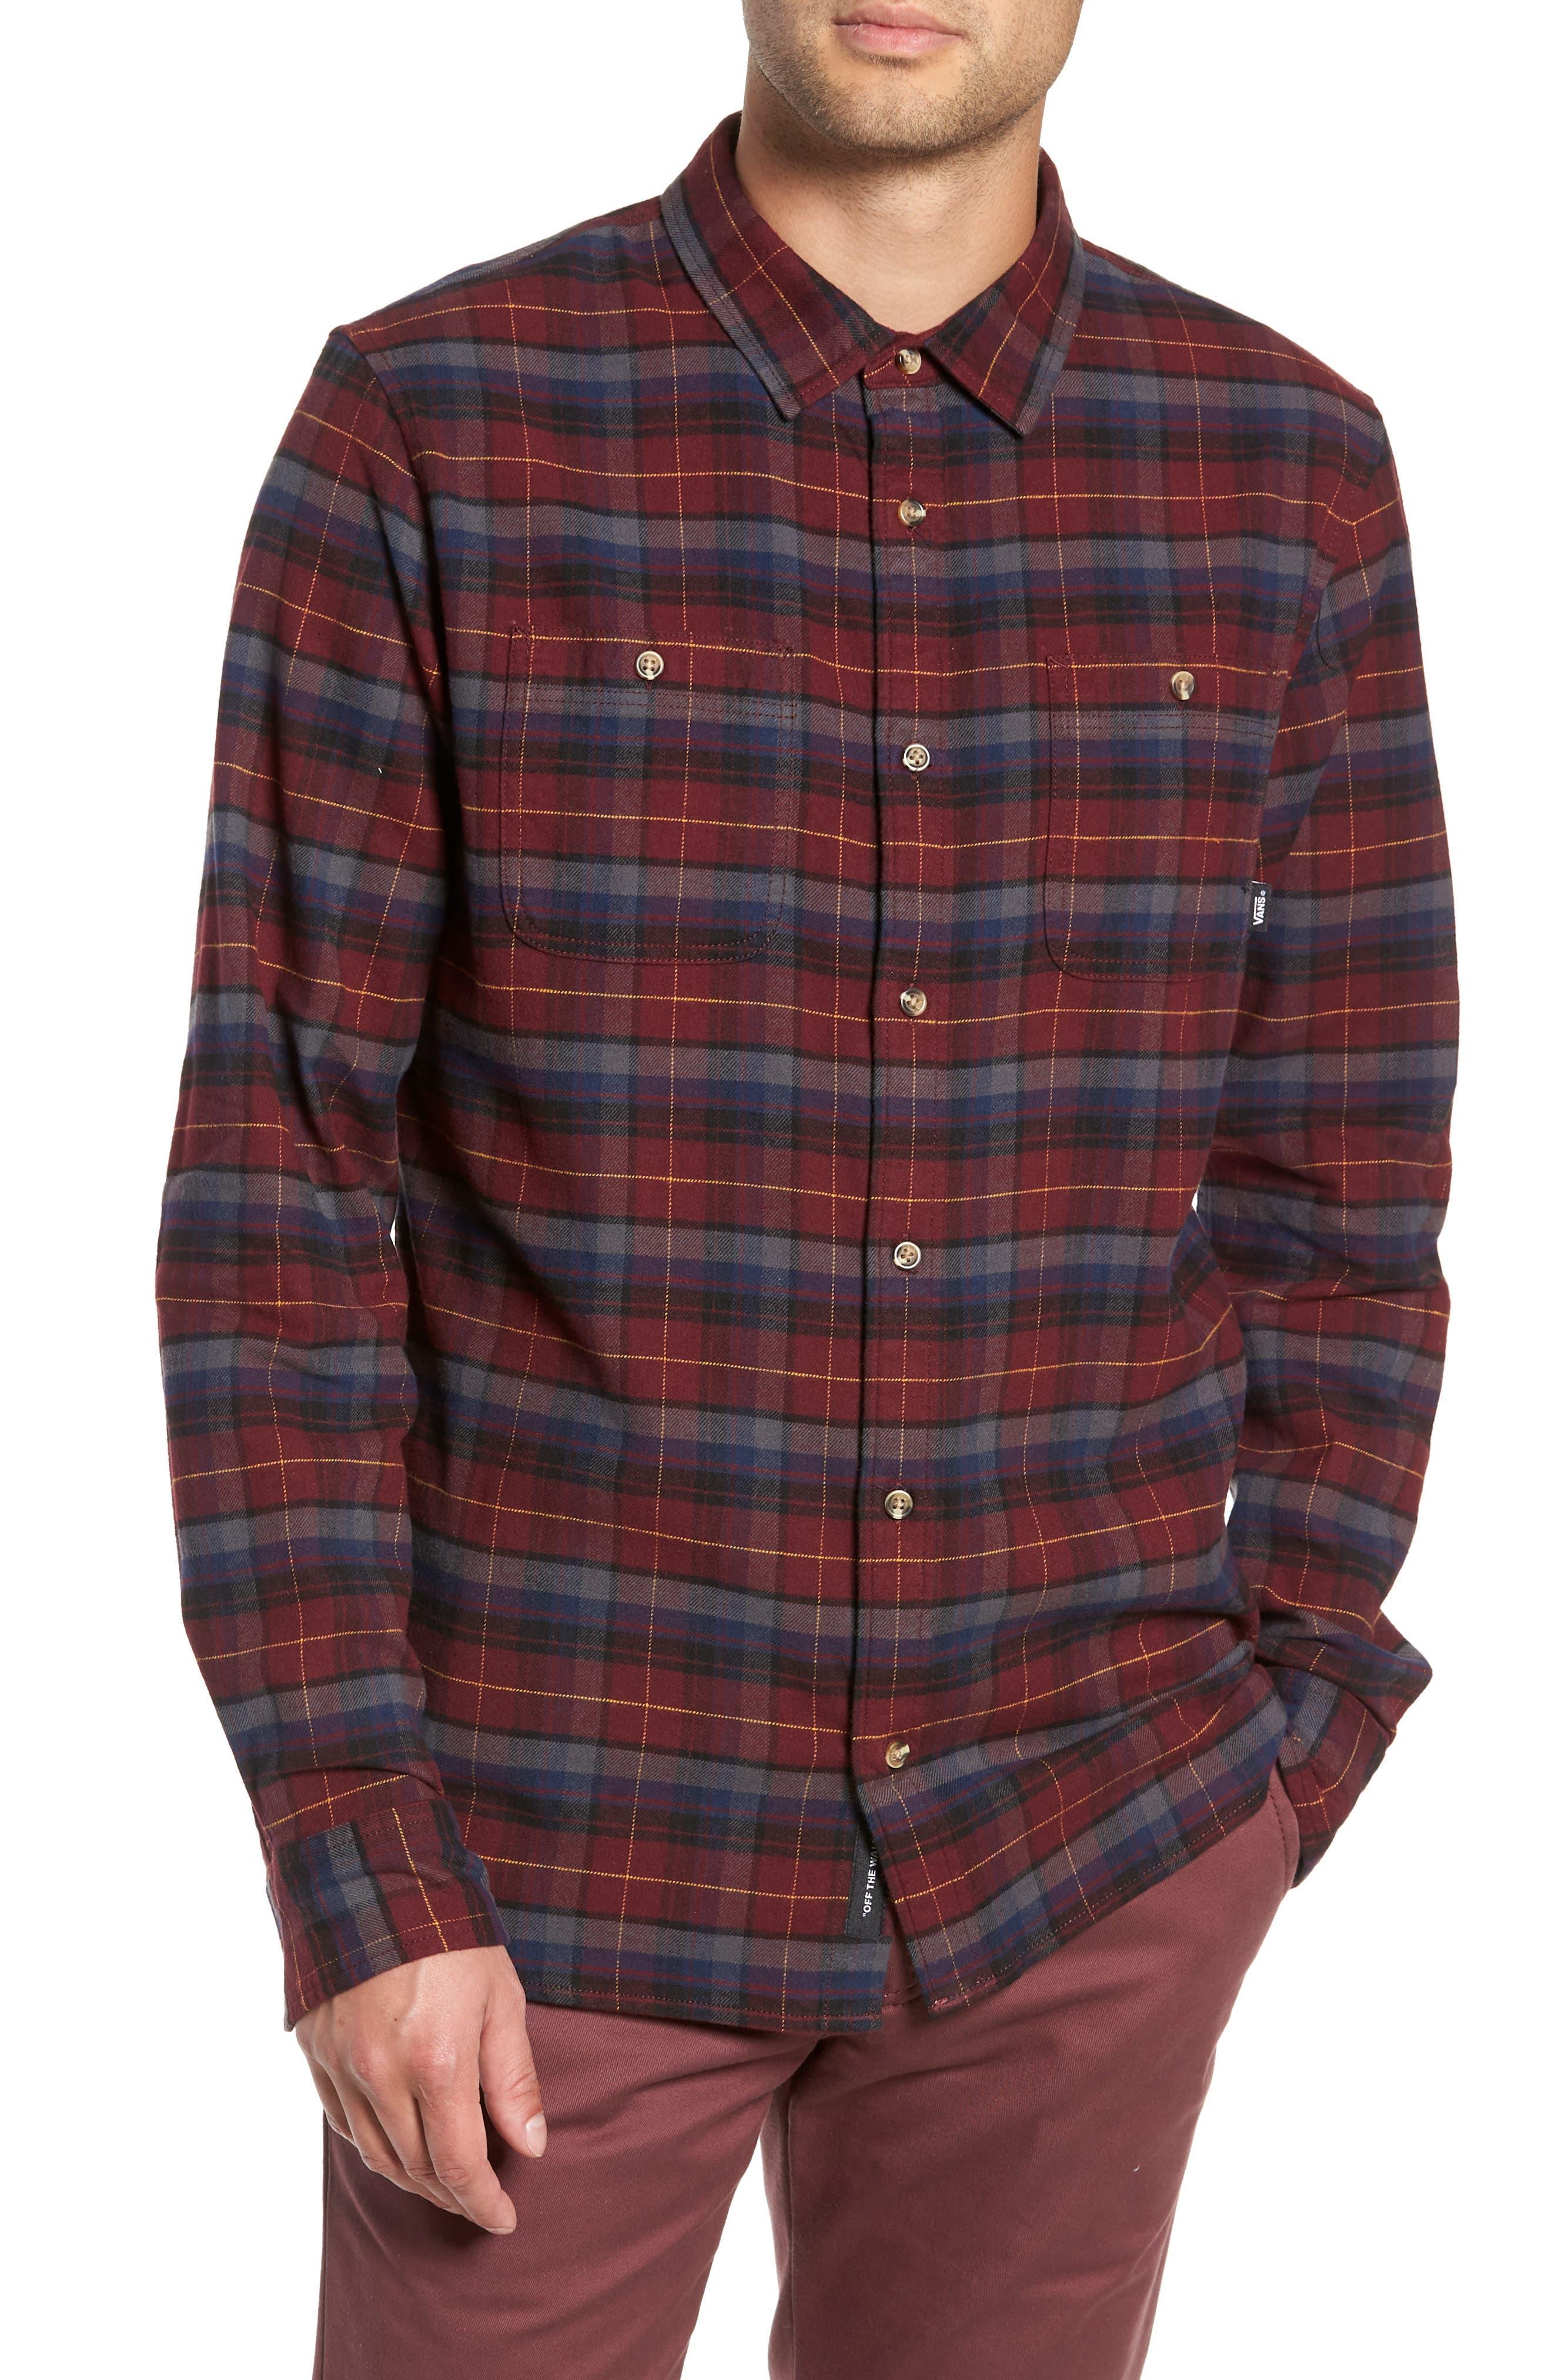 Banfield III Plaid Flannel Shirt,                             Main thumbnail 1, color,                             930